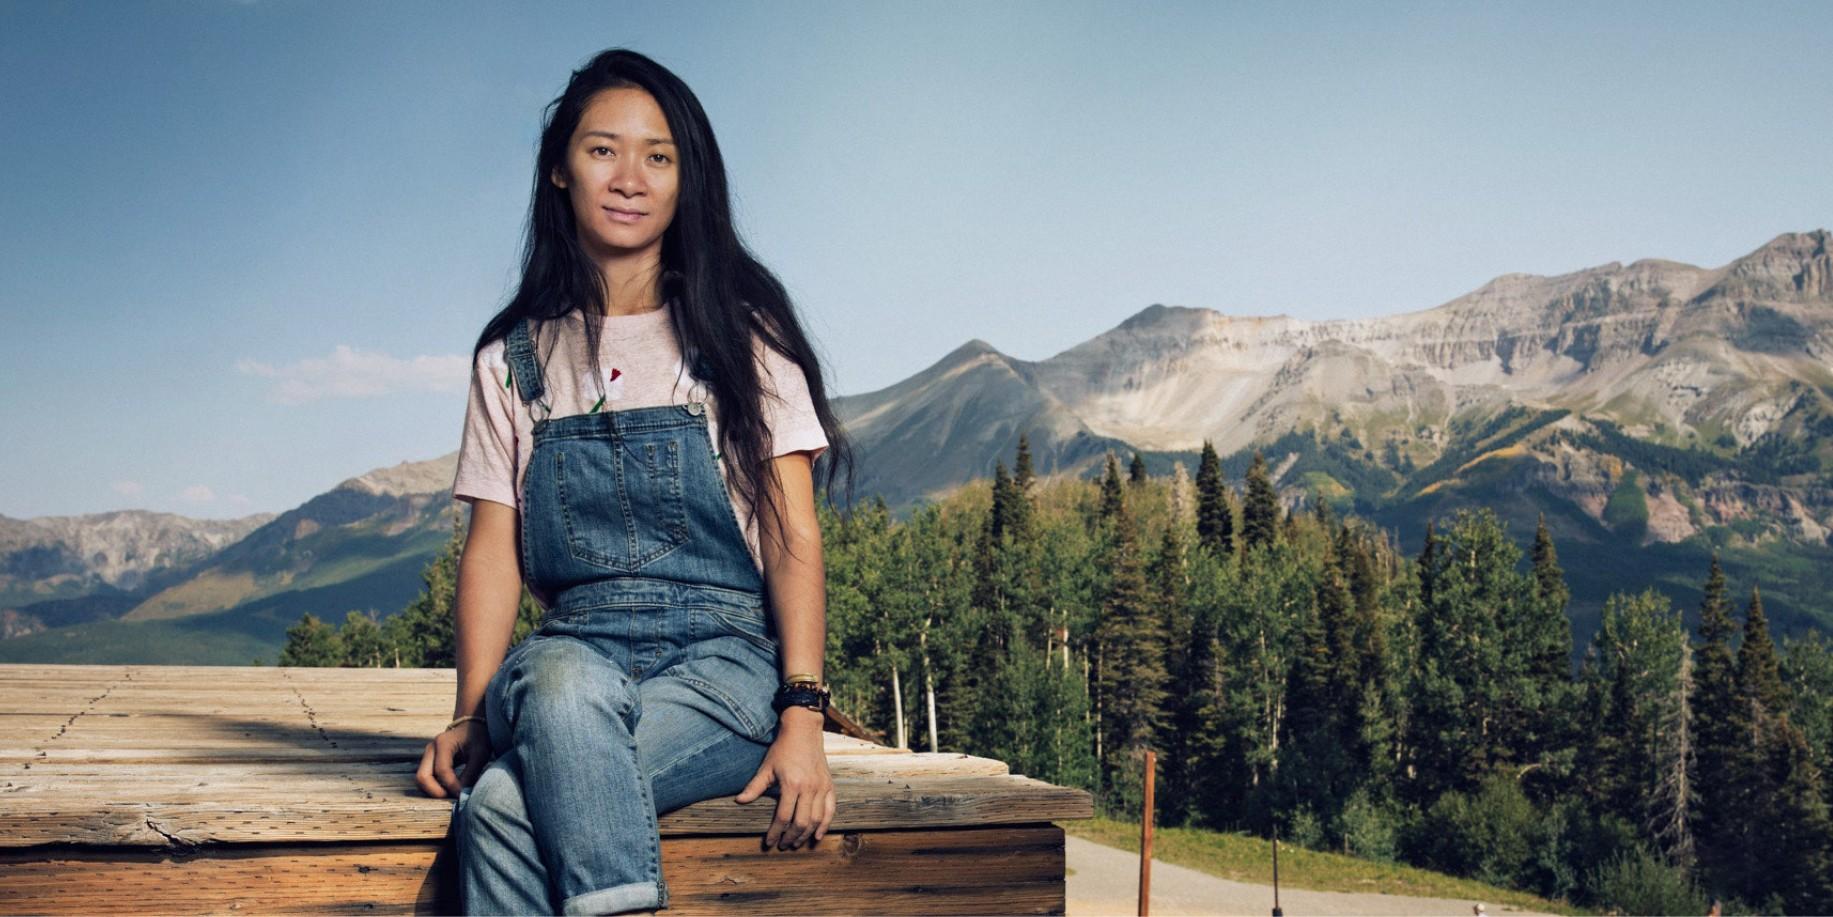 Chloé Zhao: Ποια είναι η πρώτη Ασιάτισσα γυναίκα που κέρδισε το βραβείο σκηνοθεσίας στις Χρυσές Σφαίρες;